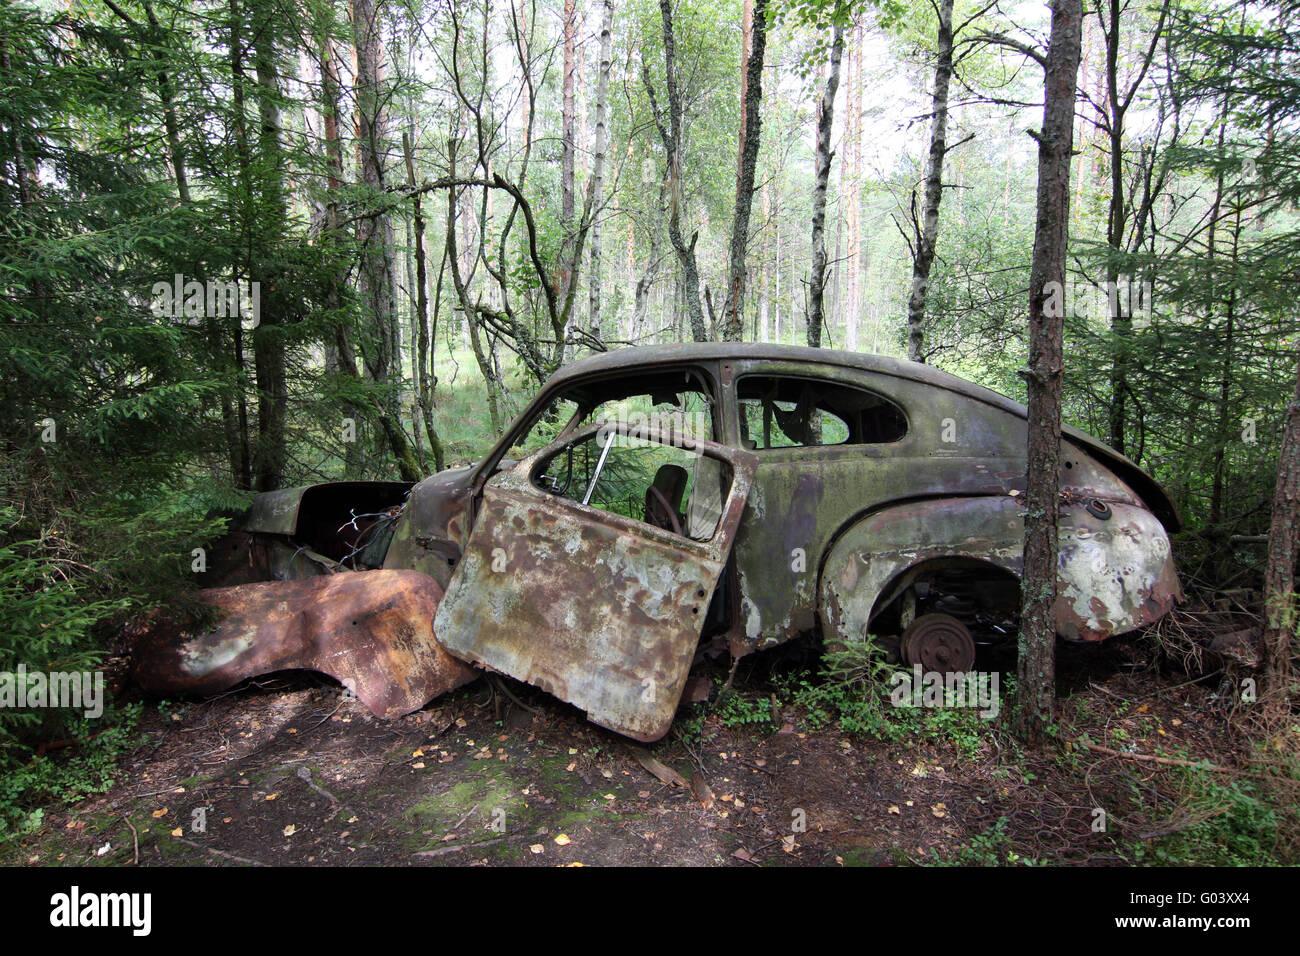 car wreck - scap motorcar vehicle - junkyard Stock Photo